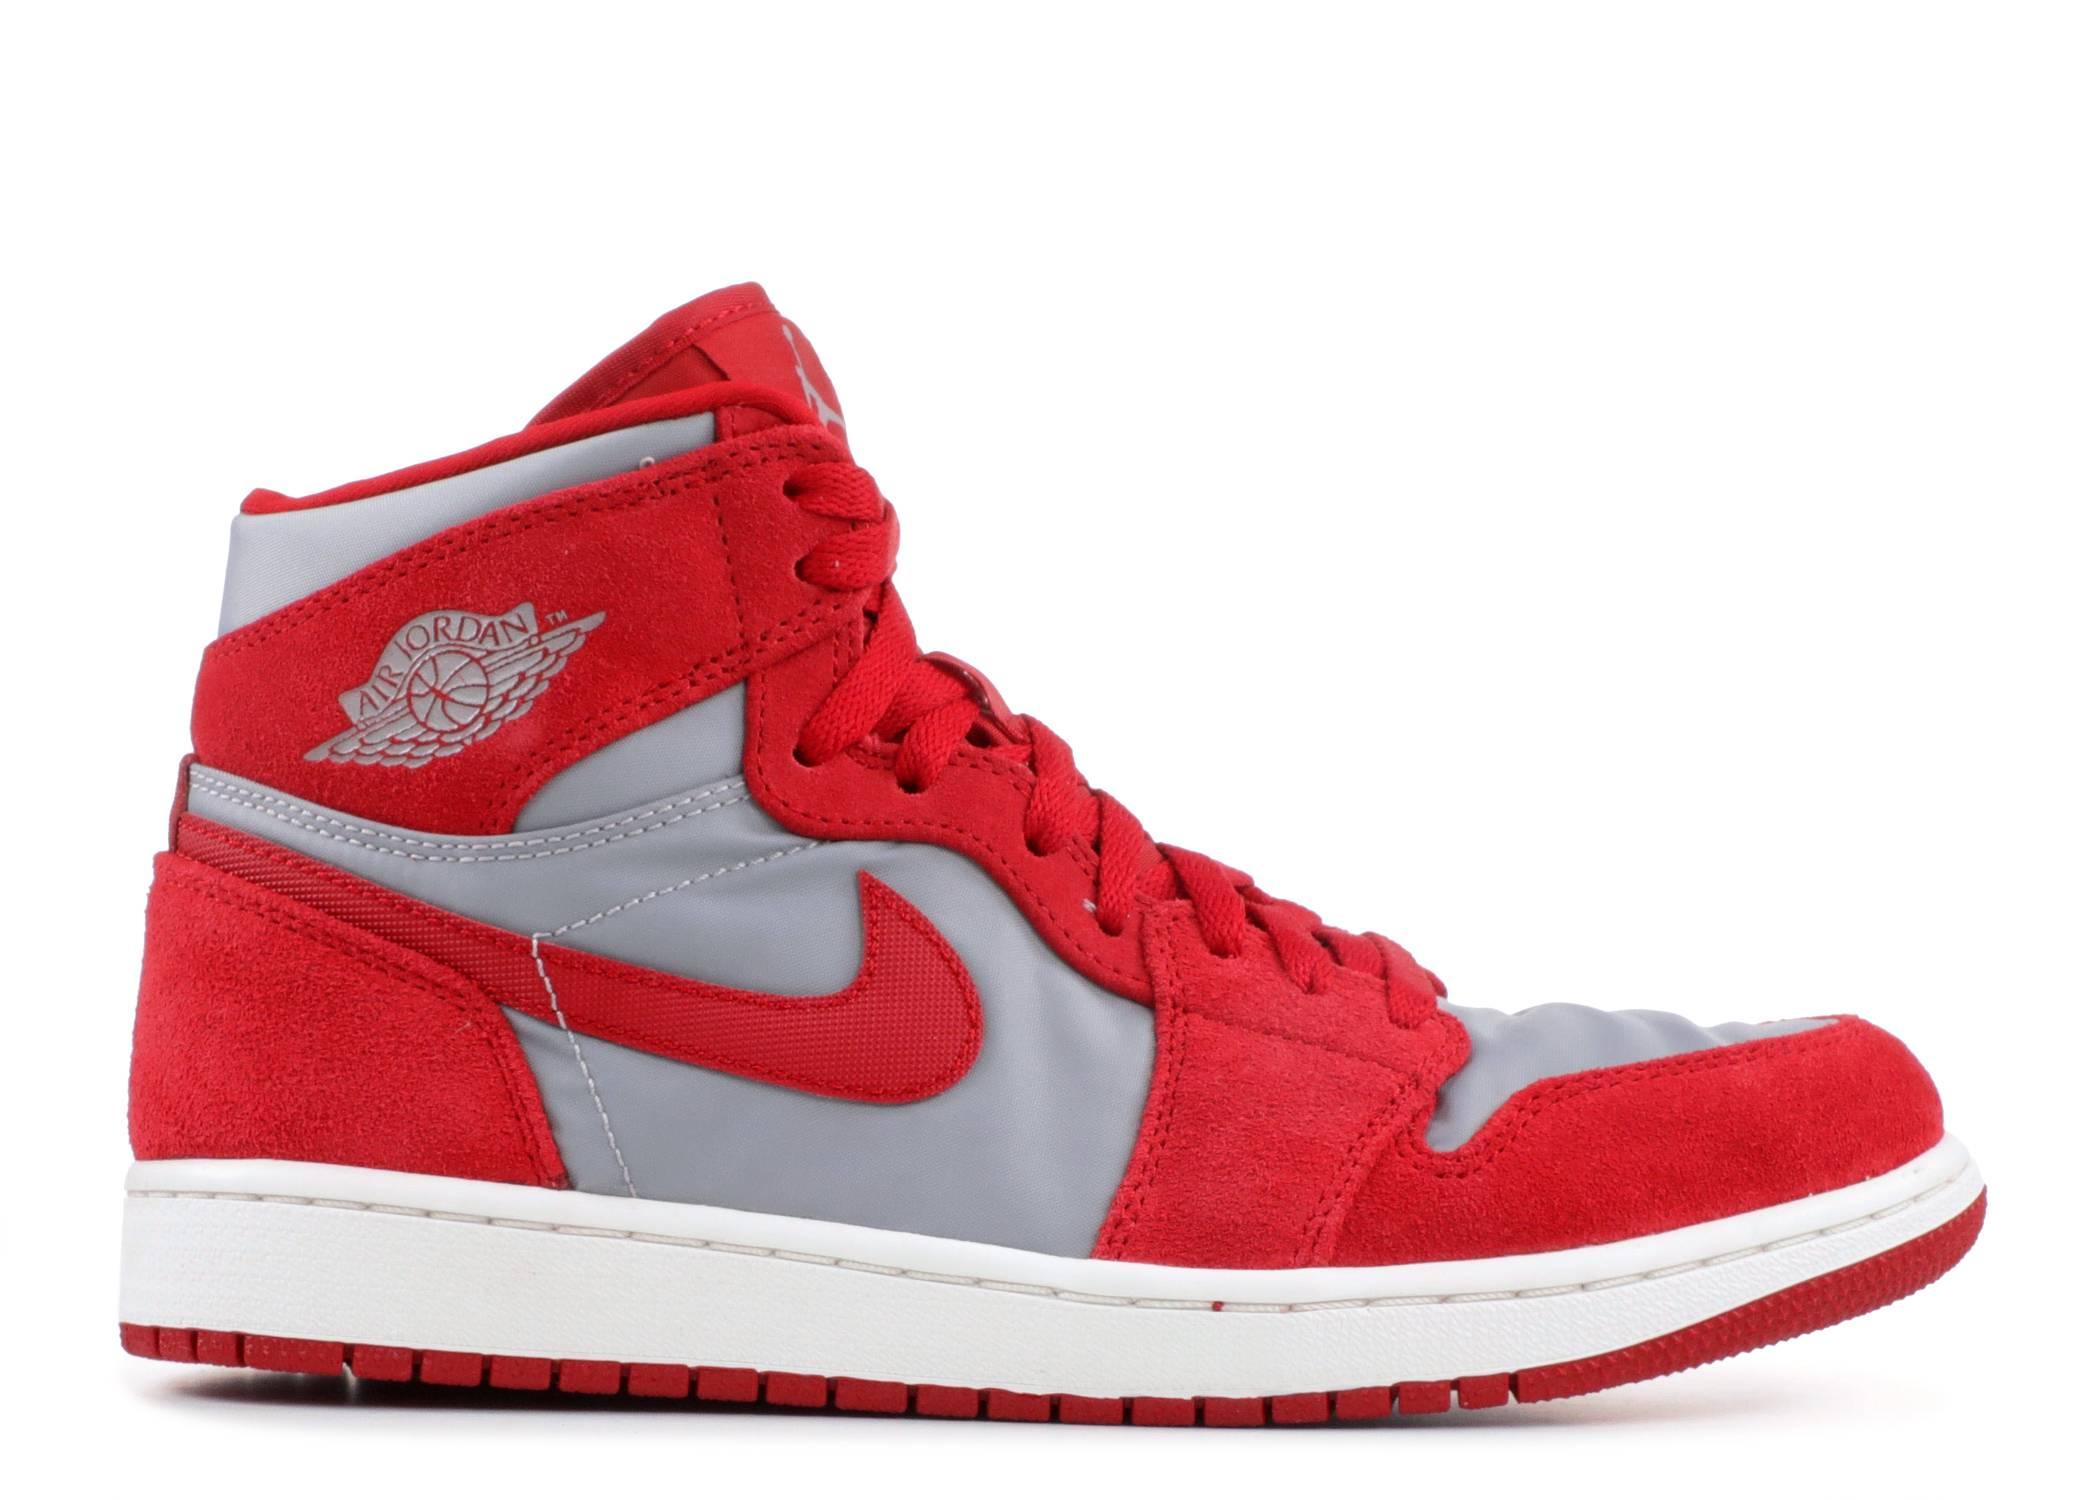 2bc6371799e Air Jordan 1 Retro High Prem - Air Jordan - AA3993 601 - gym red ...